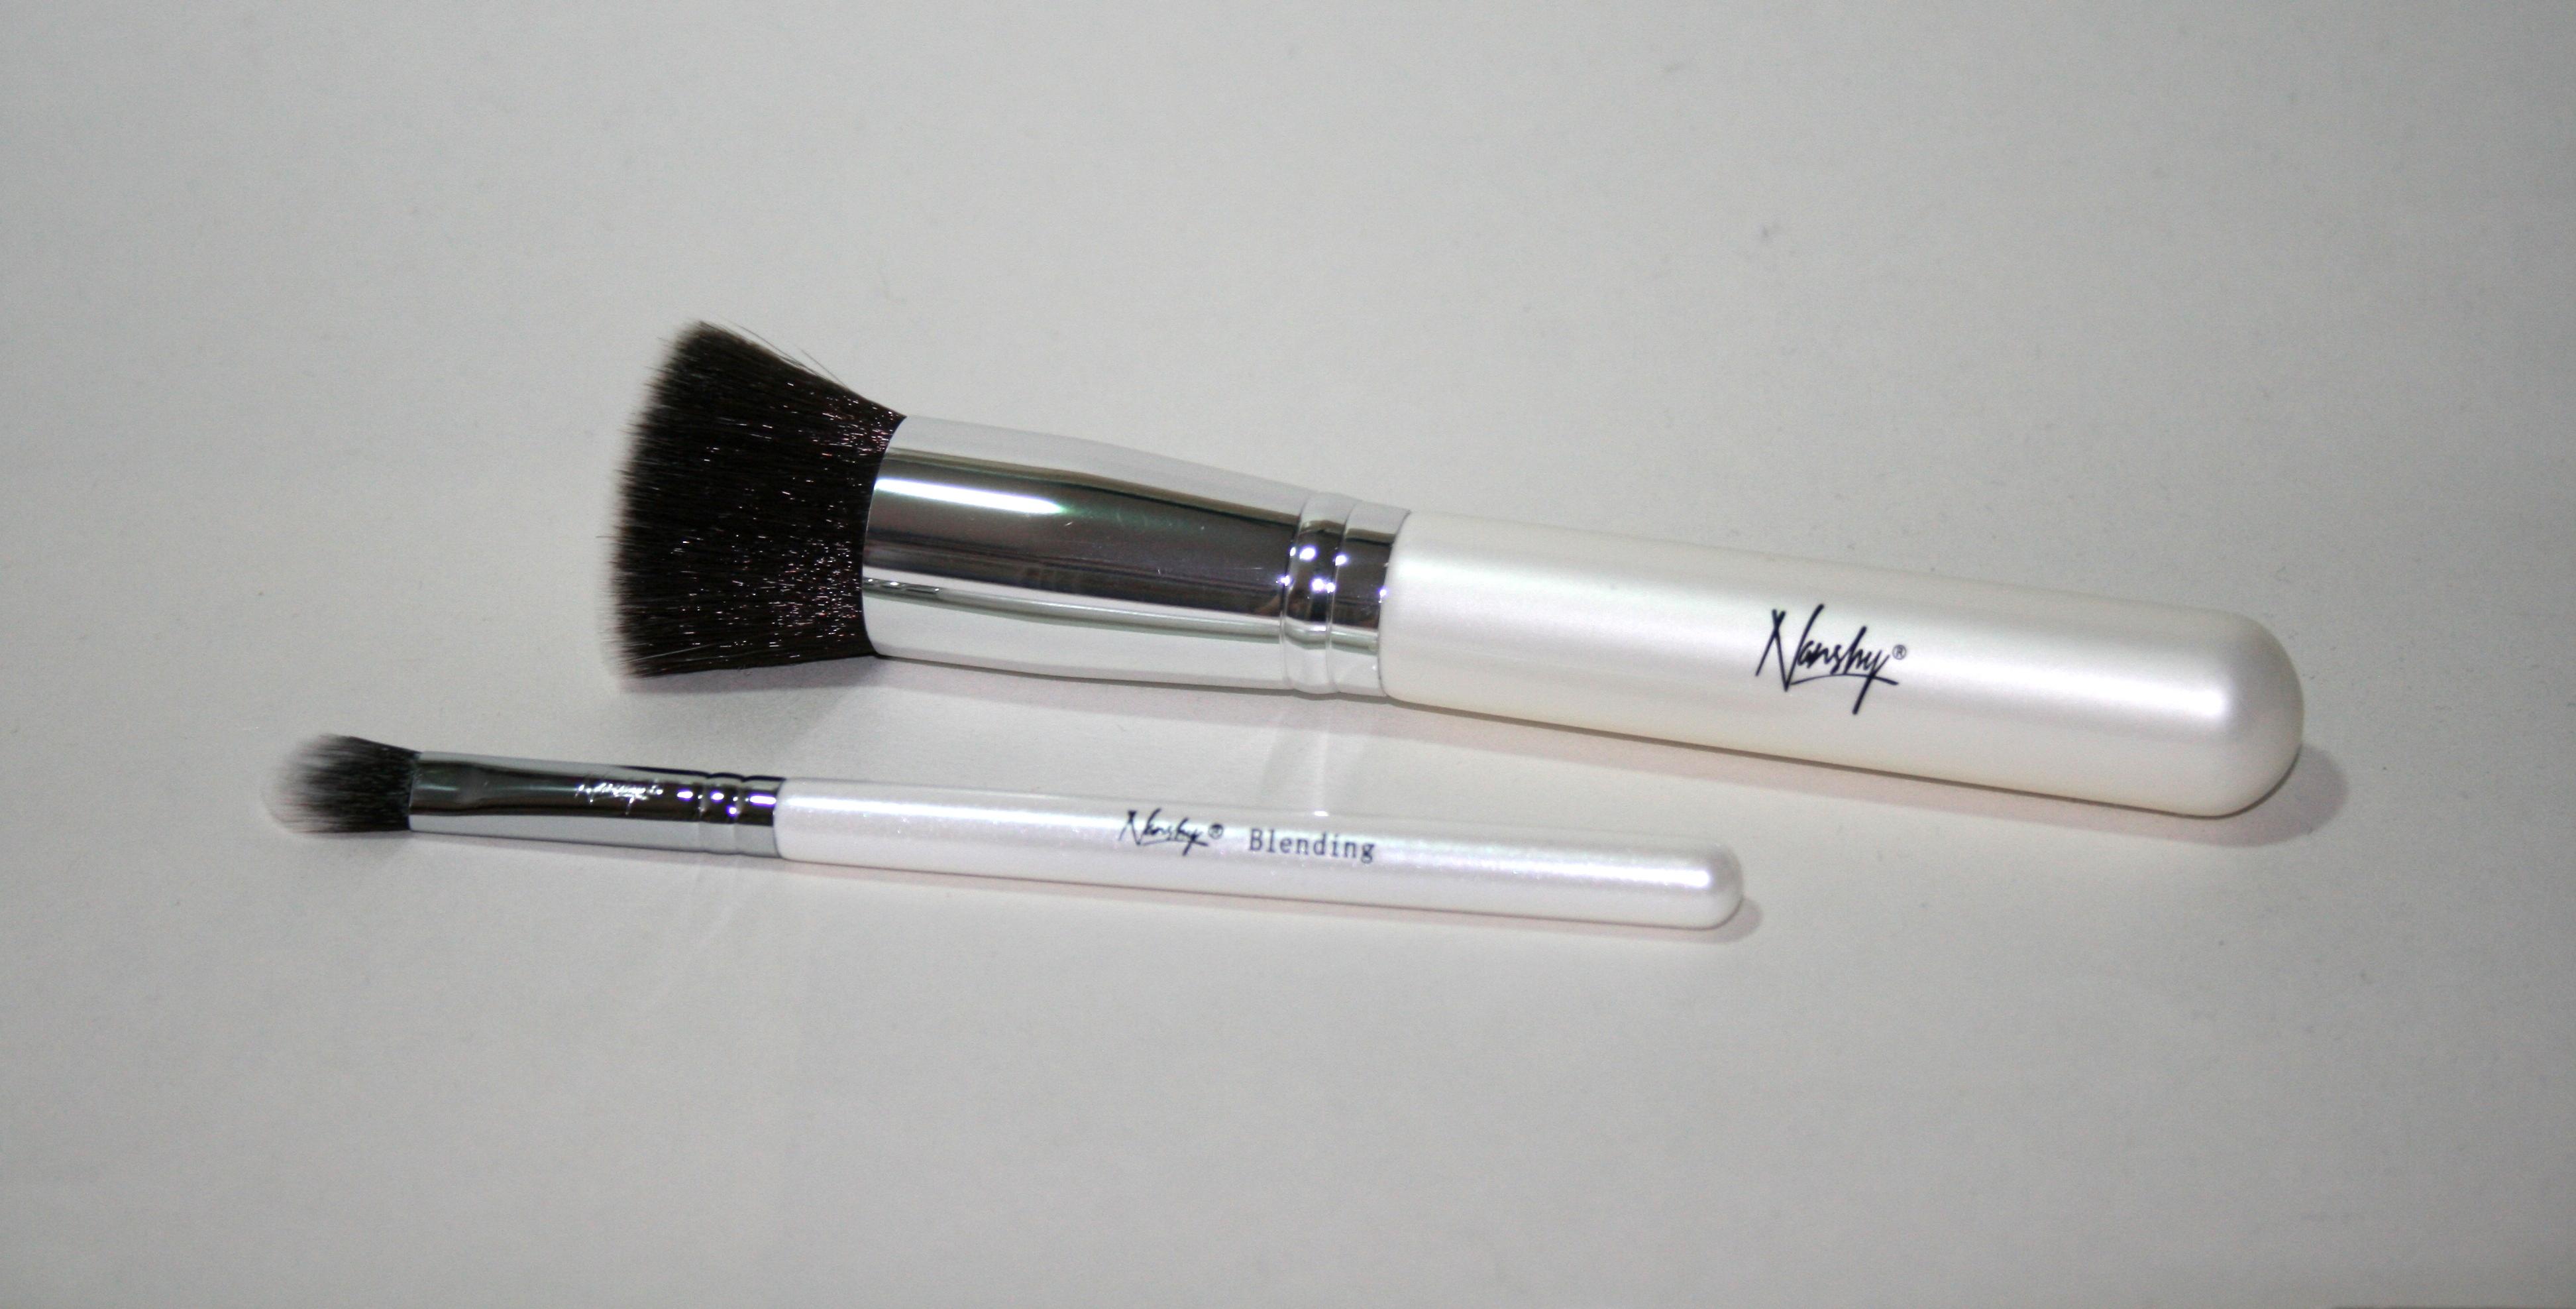 Nanshy Flat Top Brush and Blending Eye Shadow Brush